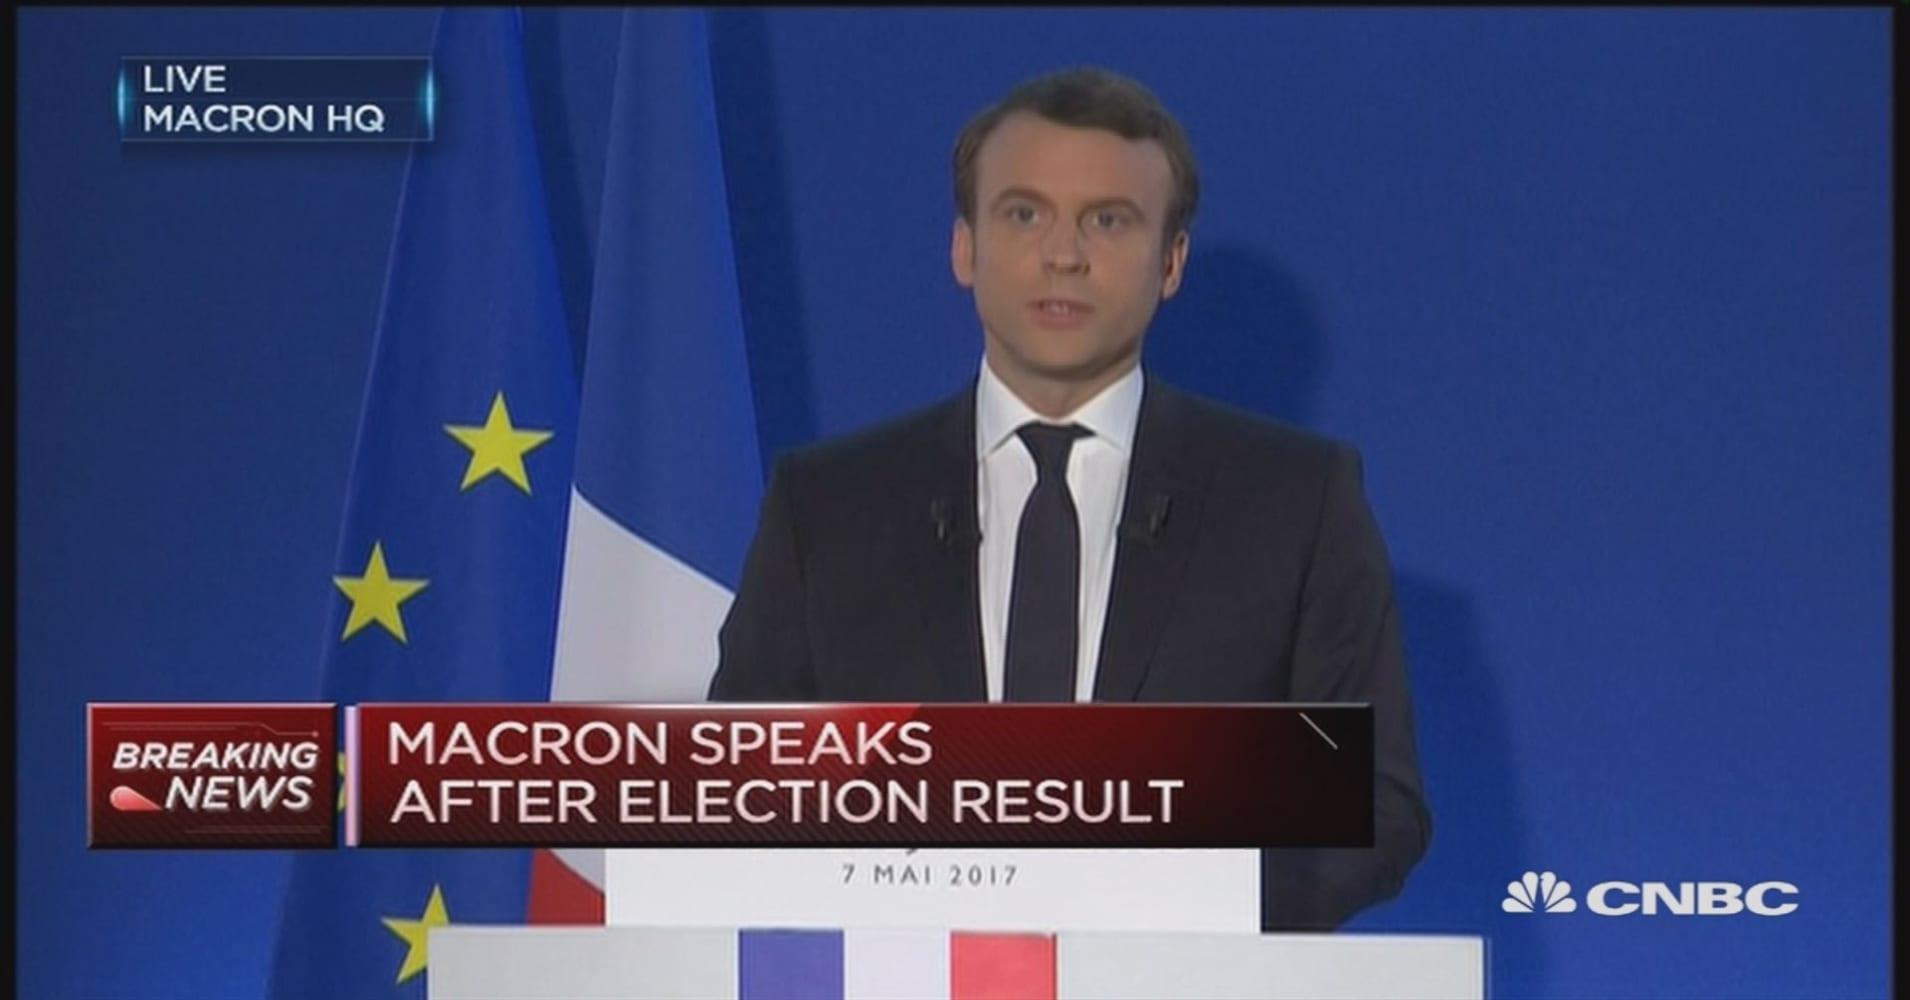 France elections 2017 live - Emmanuel Macron Speaks After Exit Polls Indicate Victory